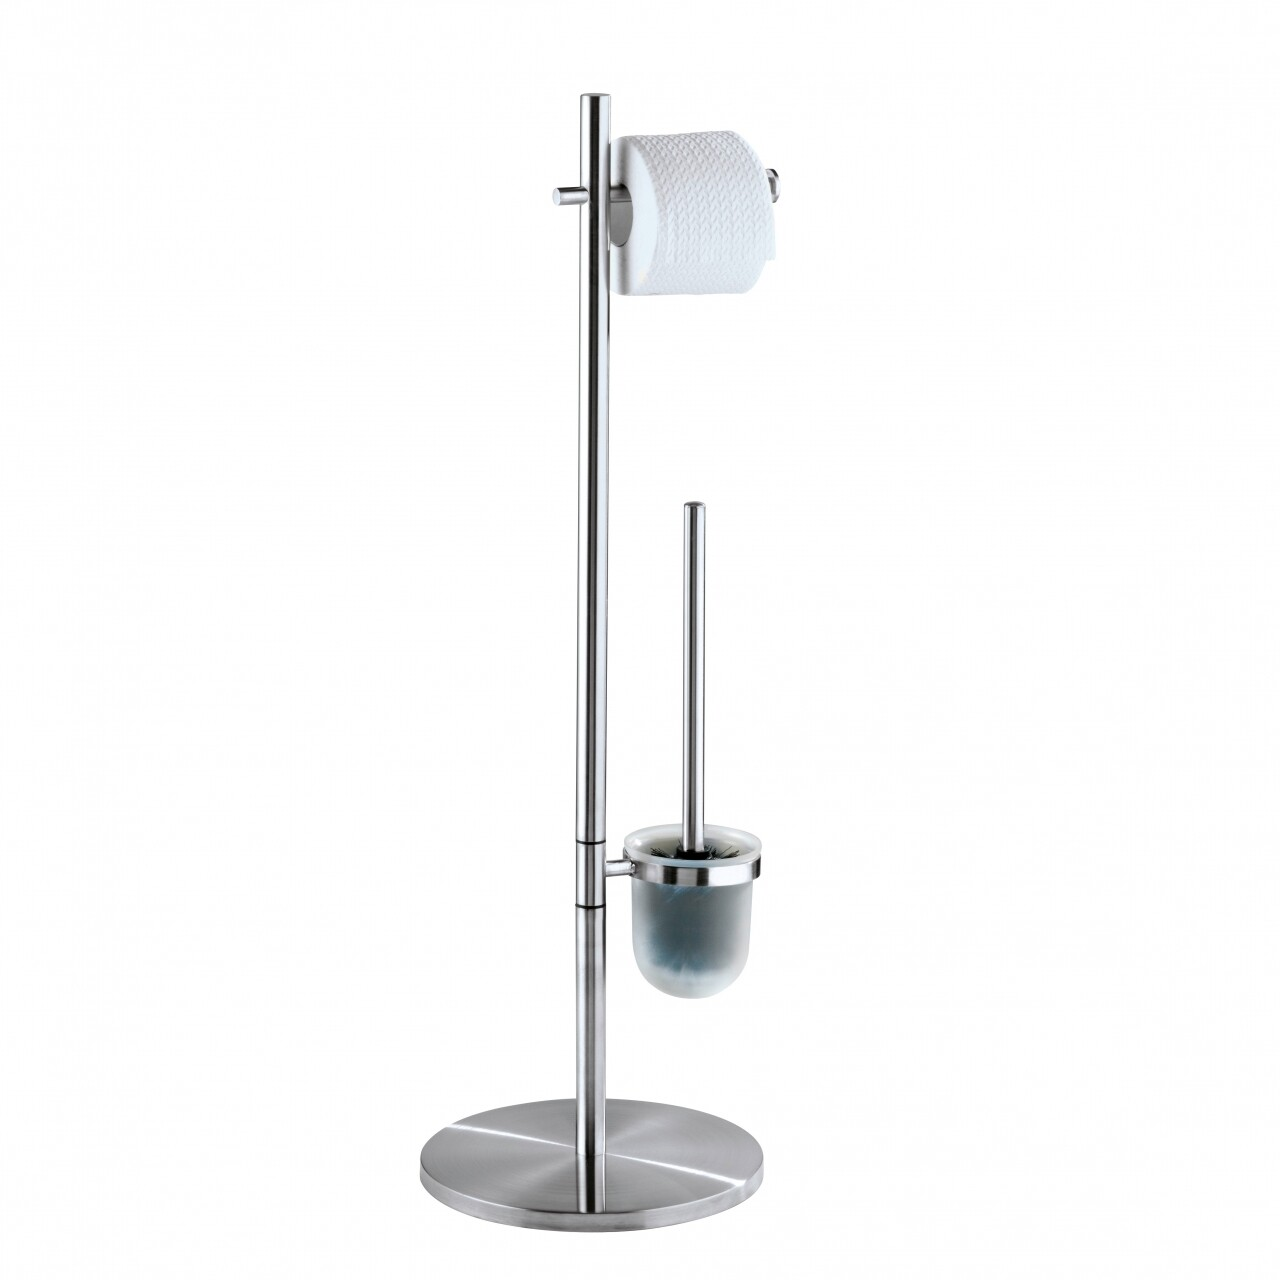 Suport hartie igienica si perie de toaleta Pieno Matt, Wenko, 26.5 x 25.5 x 79 cm, inox/polipropilena, argintiu